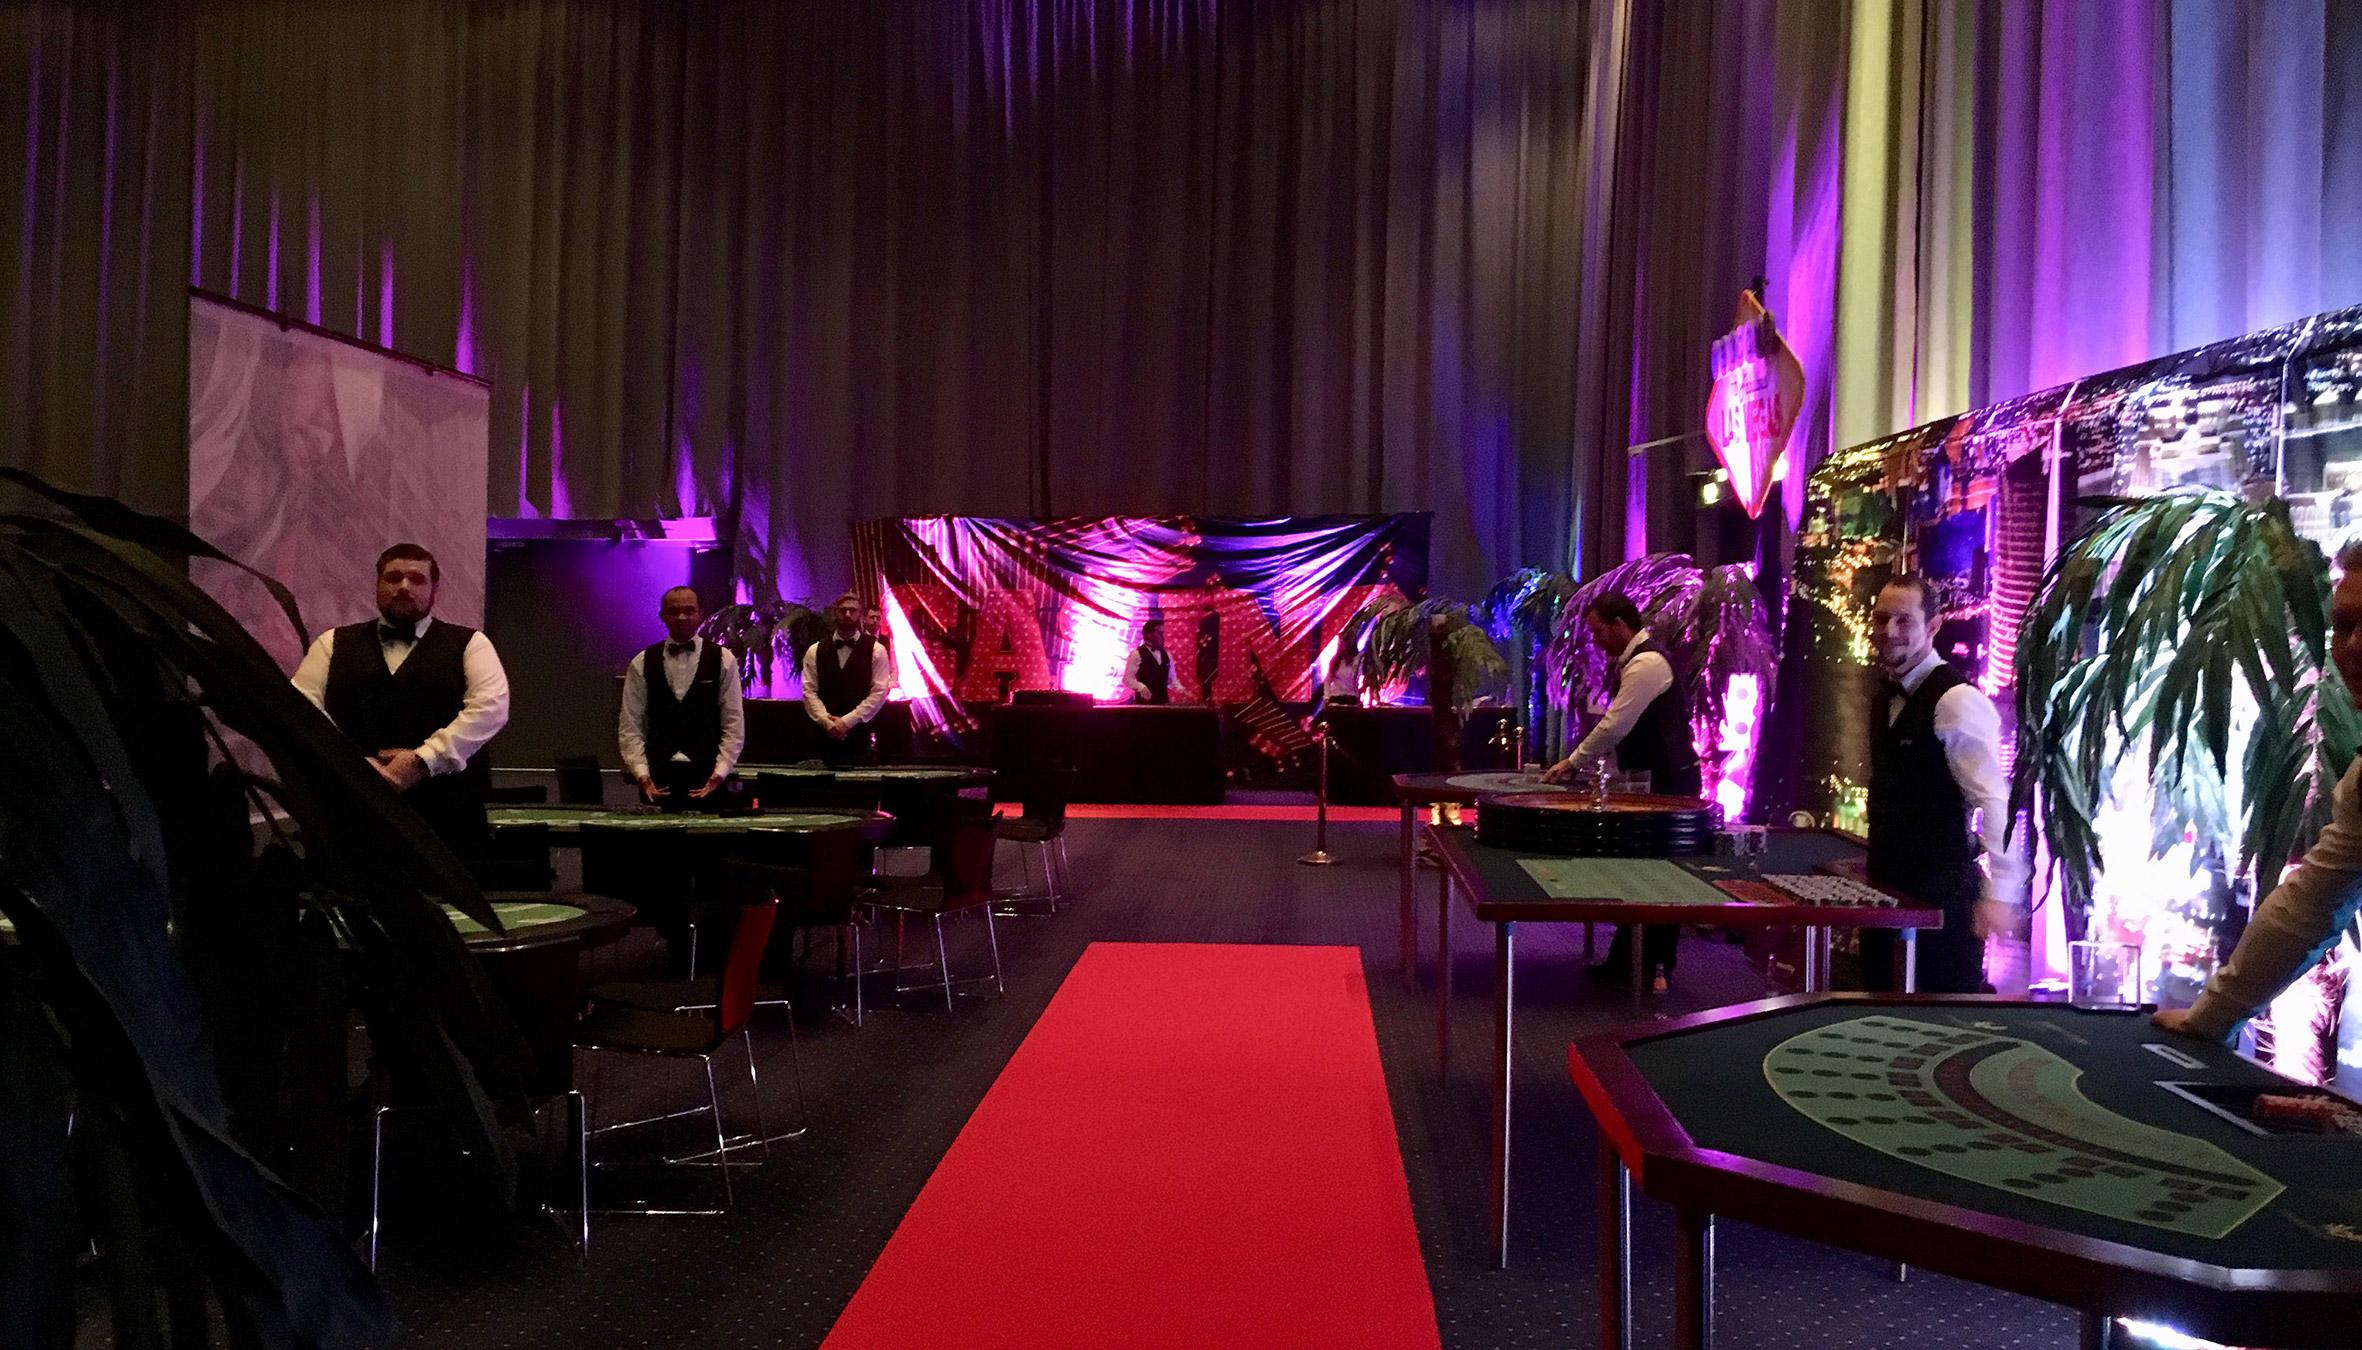 casino-event-bella-center-cph.2d